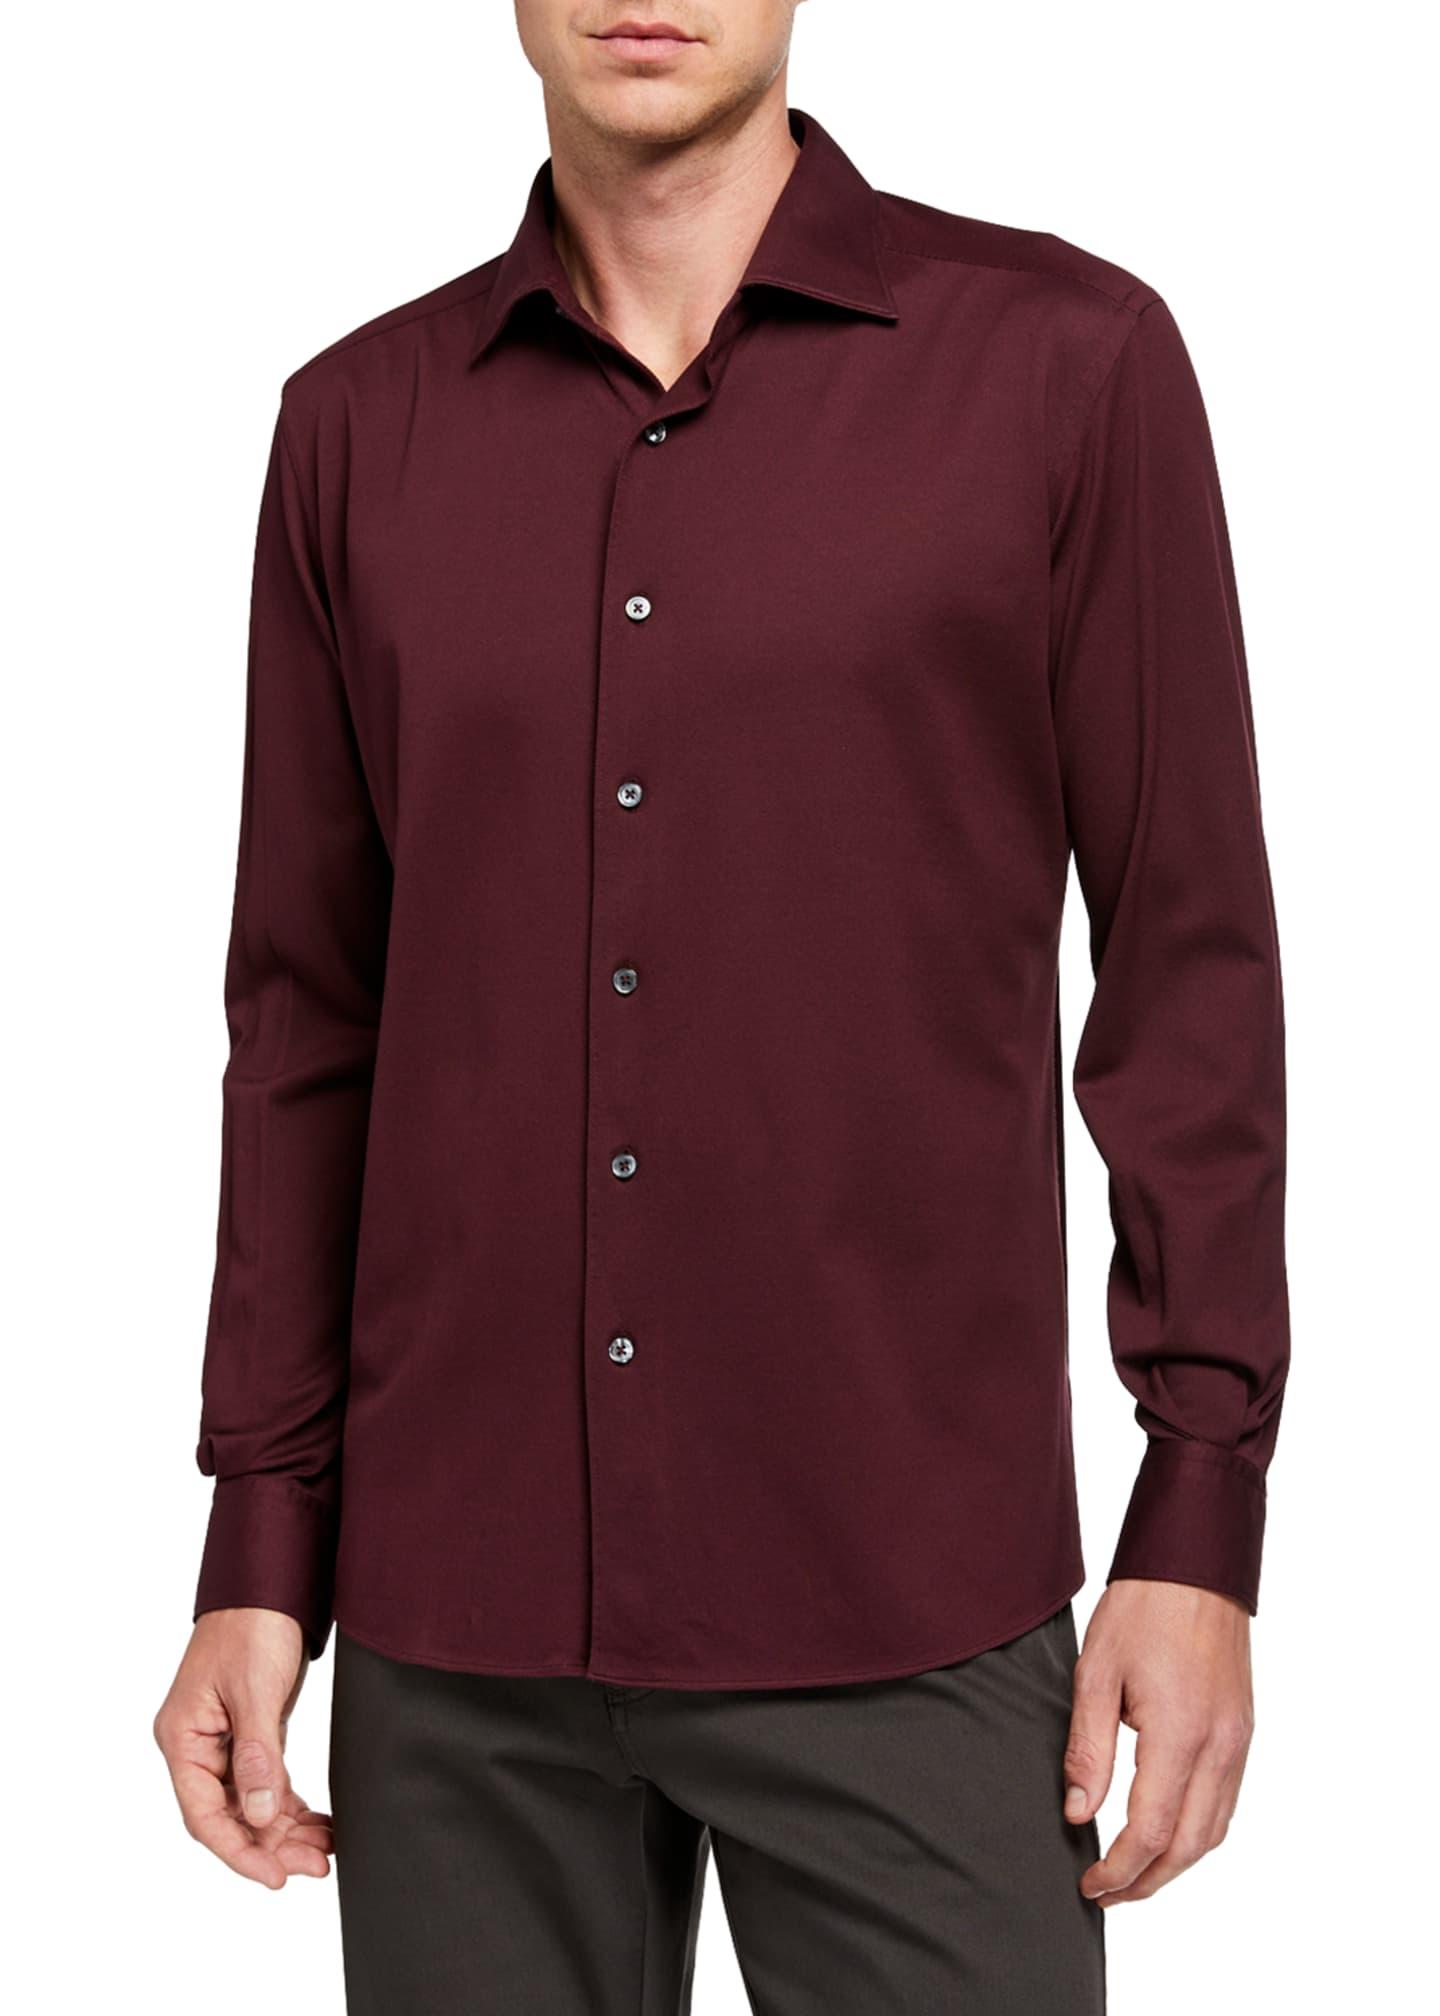 Ermenegildo Zegna Men's Cotton Jersey Sport Shirt